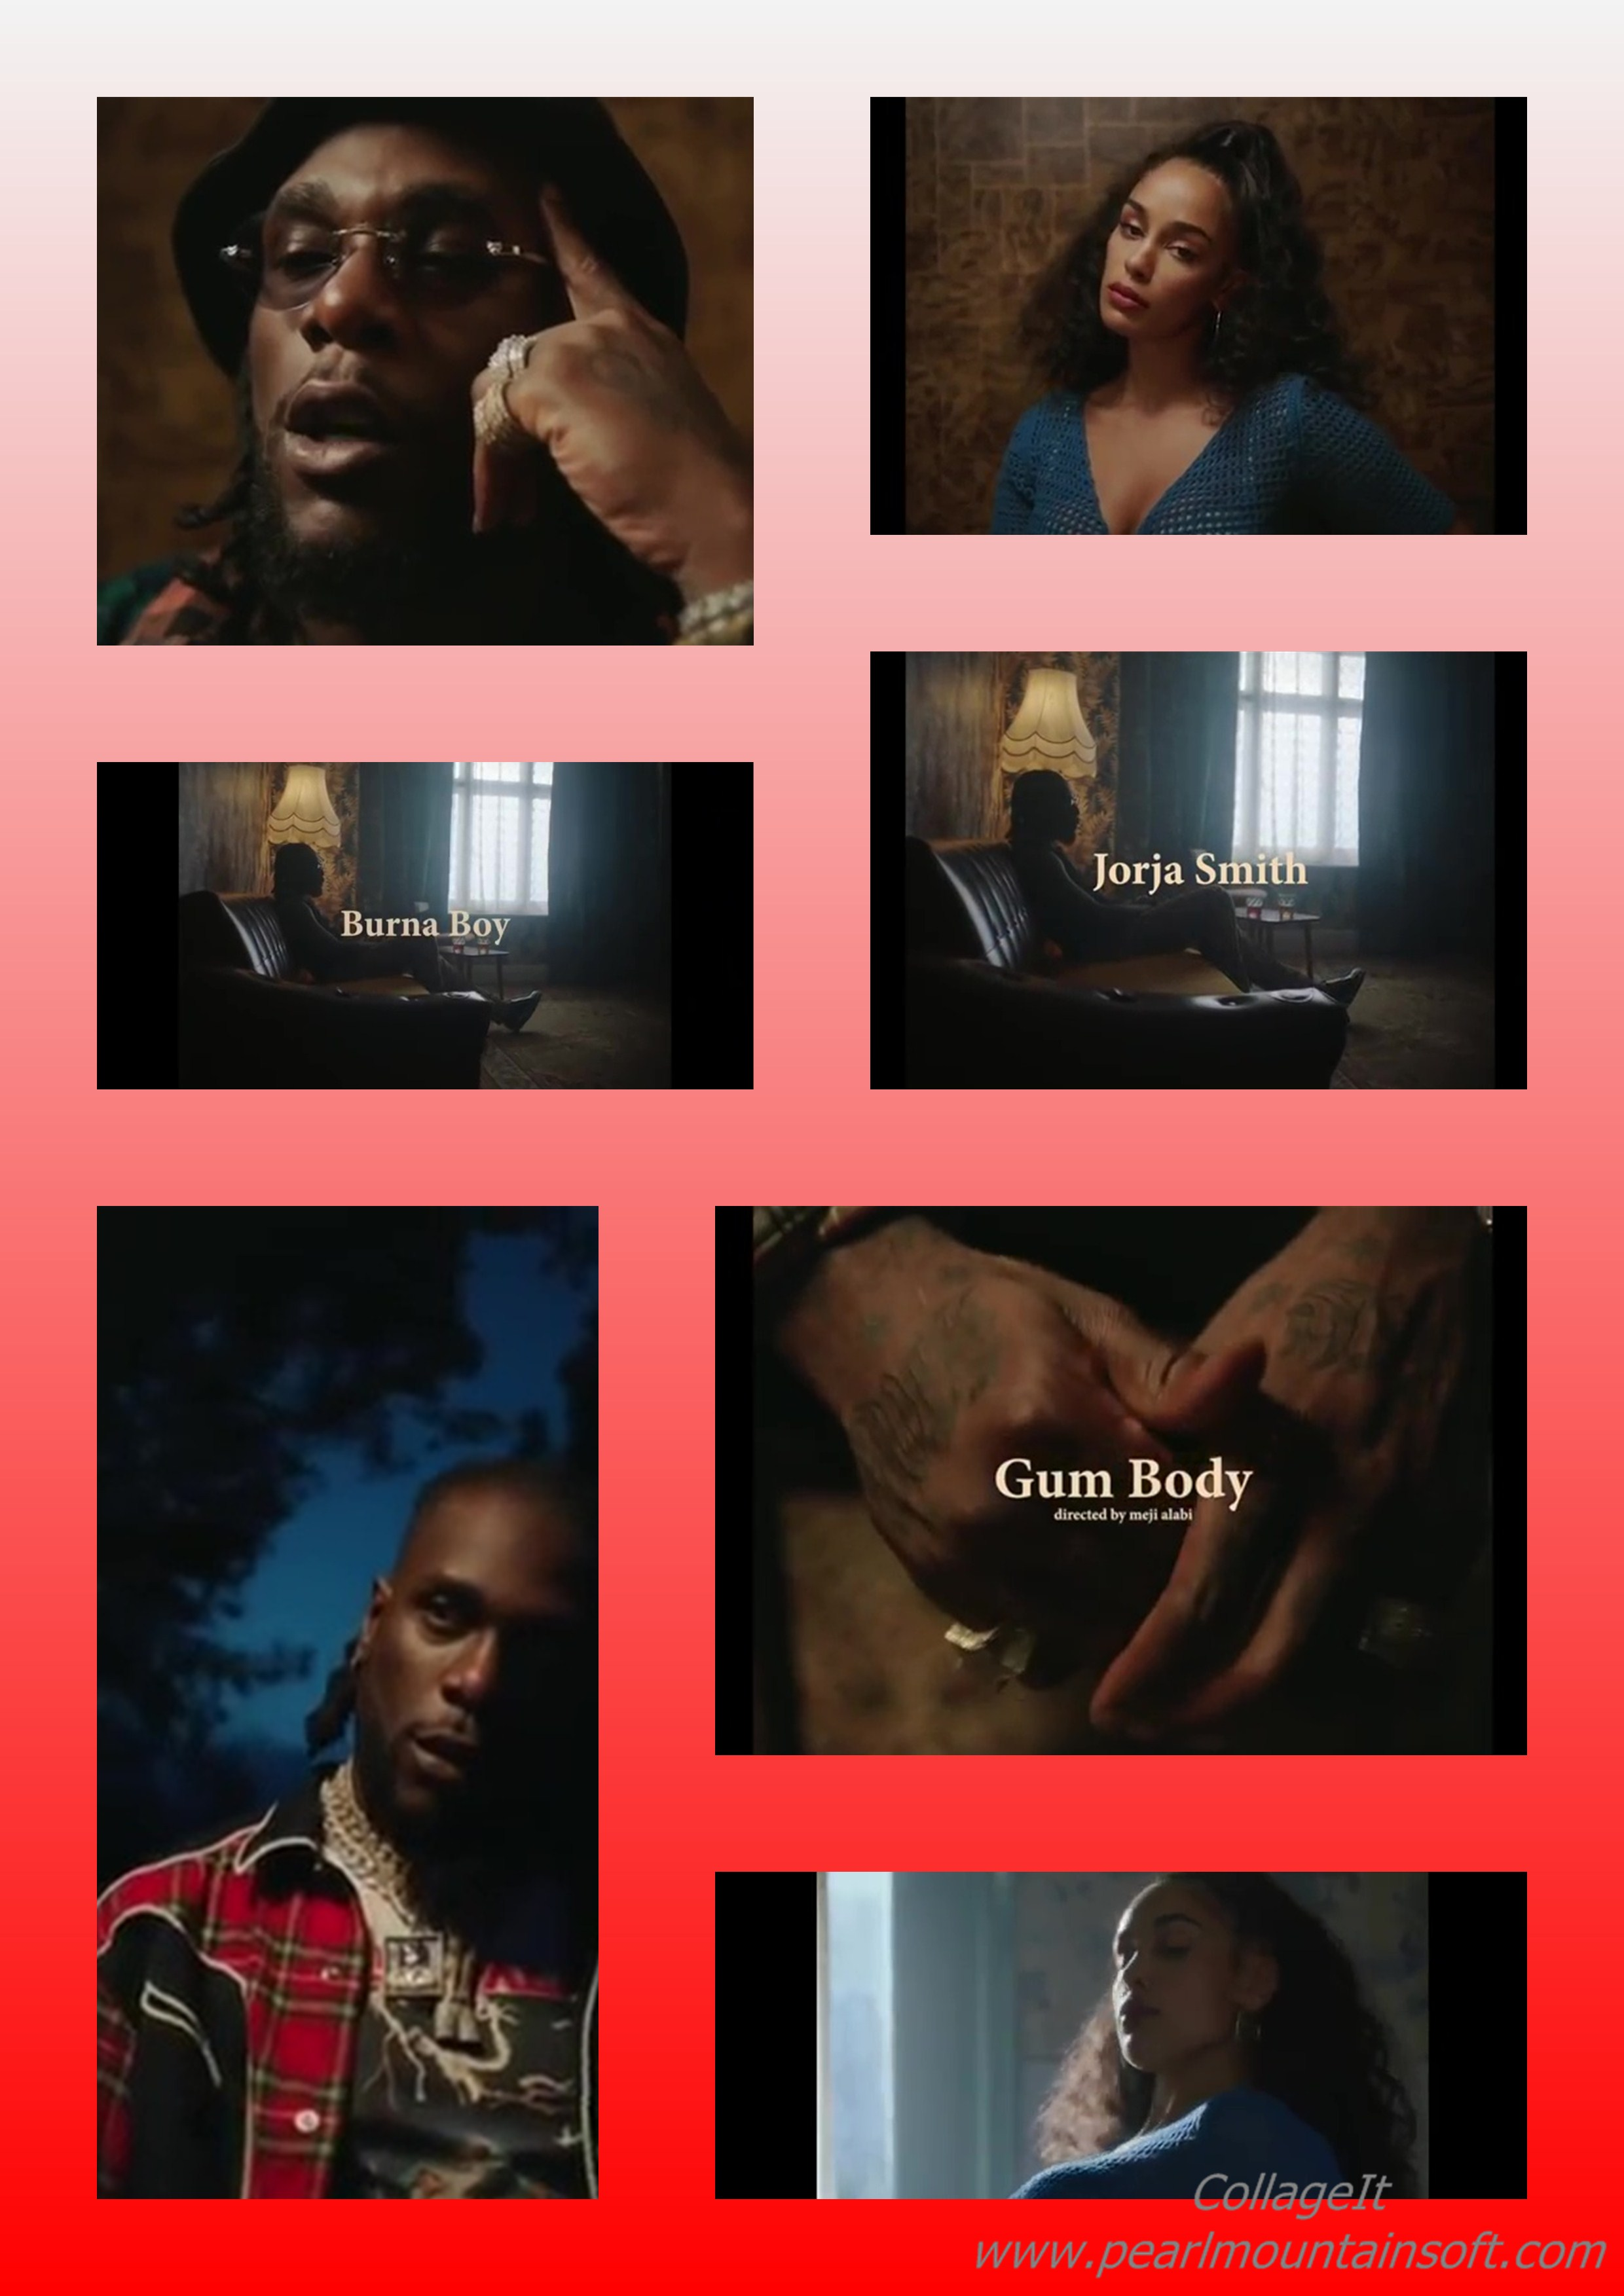 "(+LYRICS+TRANSLATION+MEANING) MUSIC REVIEW: GUM BODY BY BURNA BOY FT JORJA SMITH ""BURNA BOY DEDICATES TRACK TO EX GIRLFRIEND-'STEFFLON DON' THAT HE SUPPOSEDLY DUMPED"""